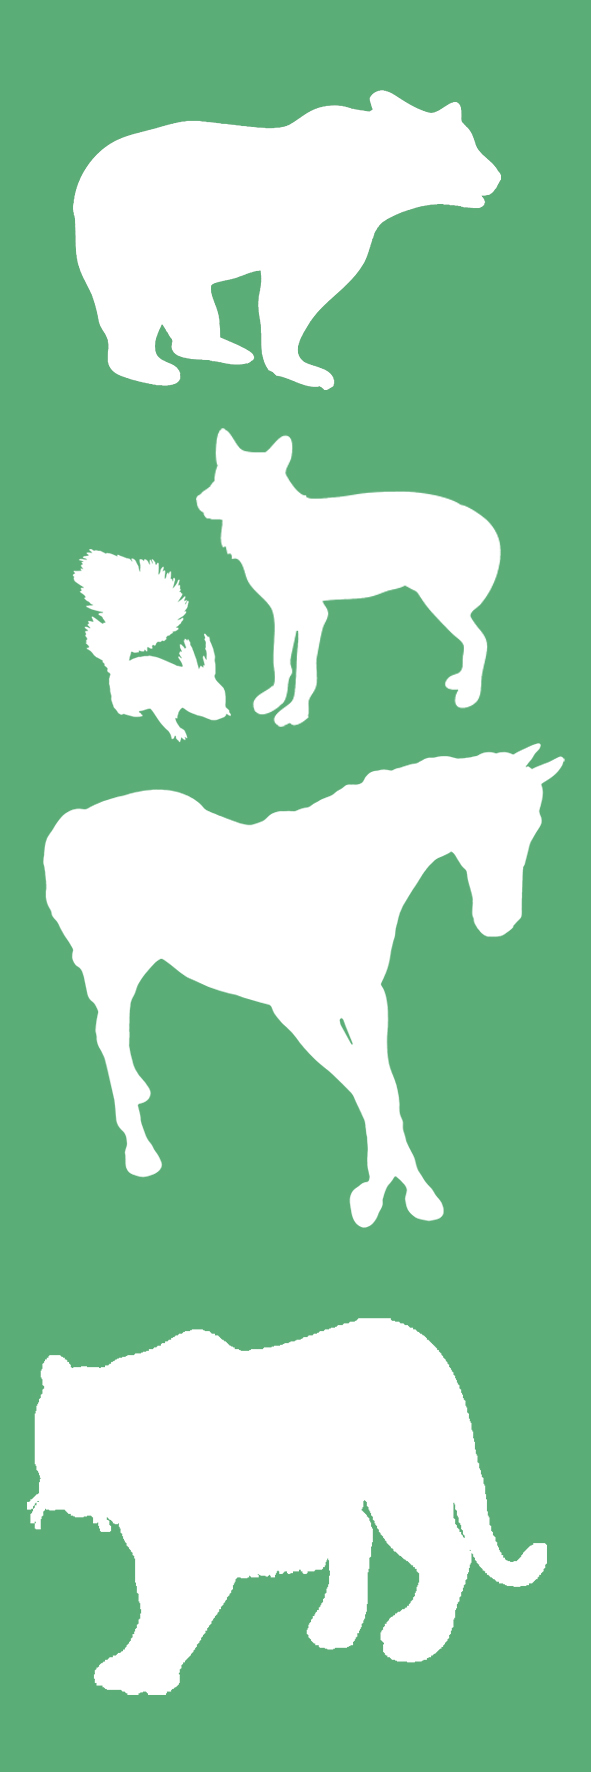 animal bookmark to print